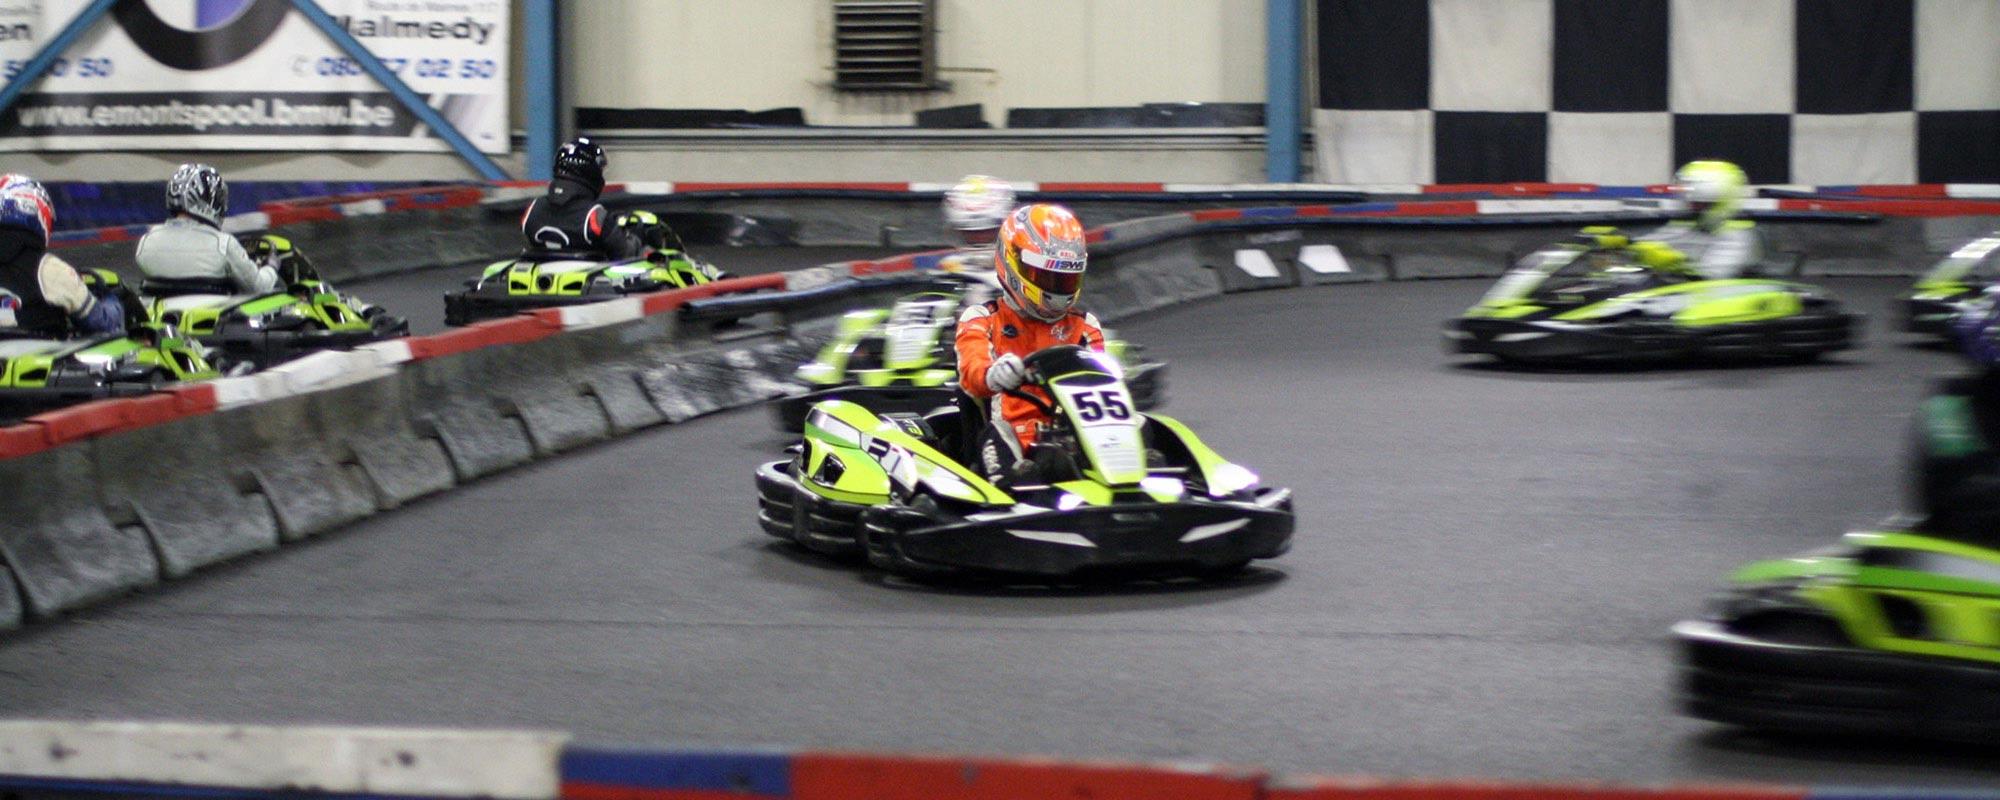 ebafkc-karting-2000x800-05